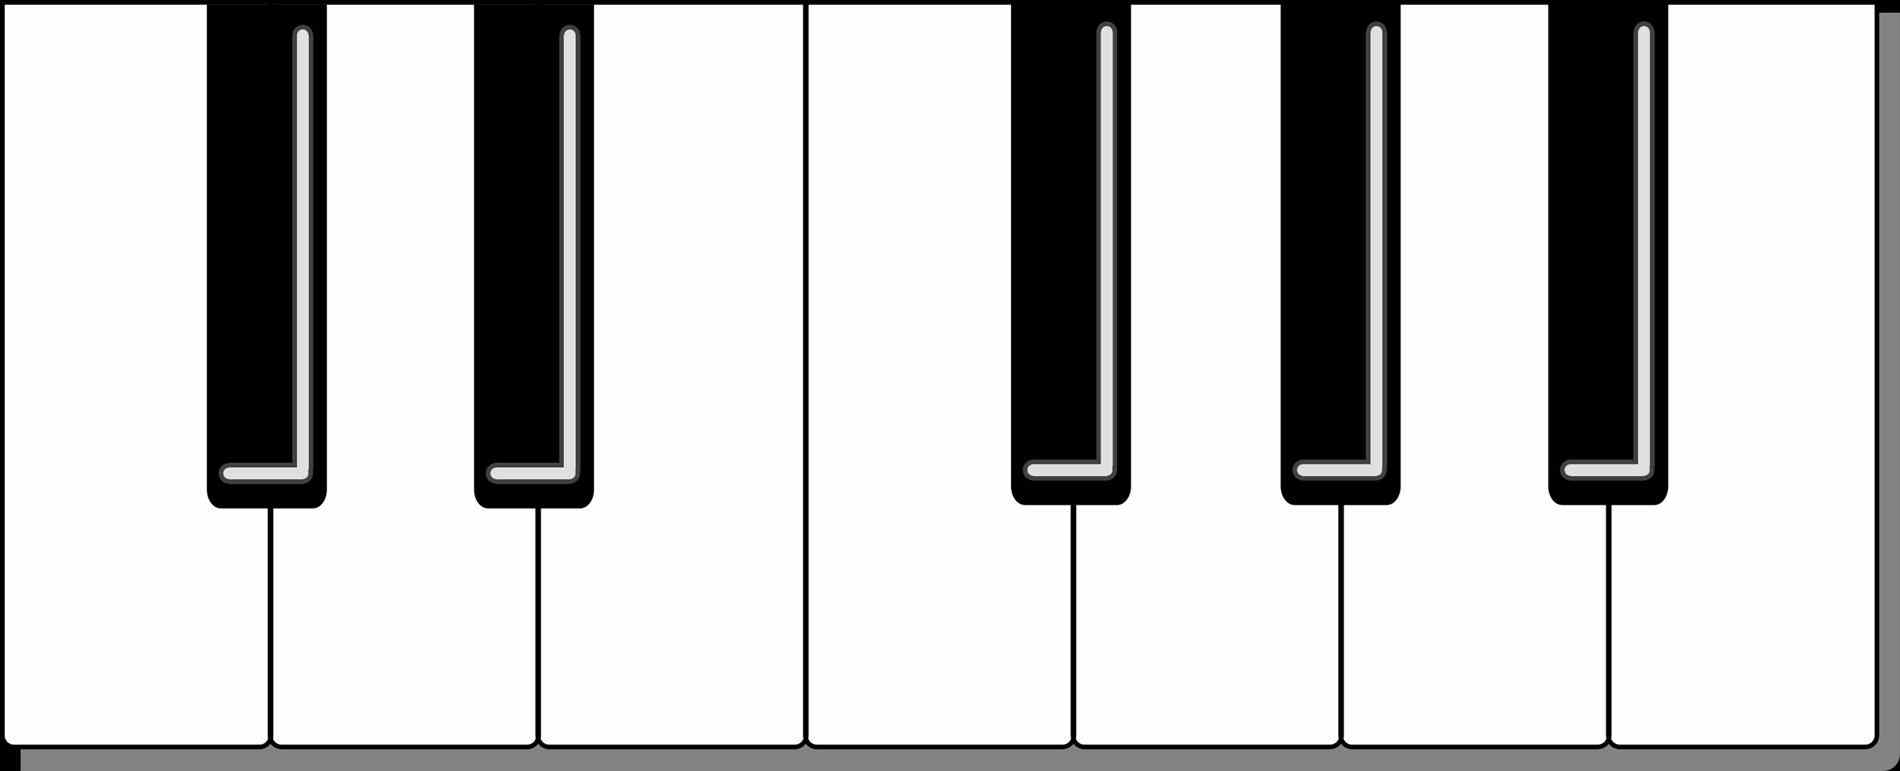 1900x771 Illustration Wallpapers Wallpaper Cave Wallpapers Piano Keys